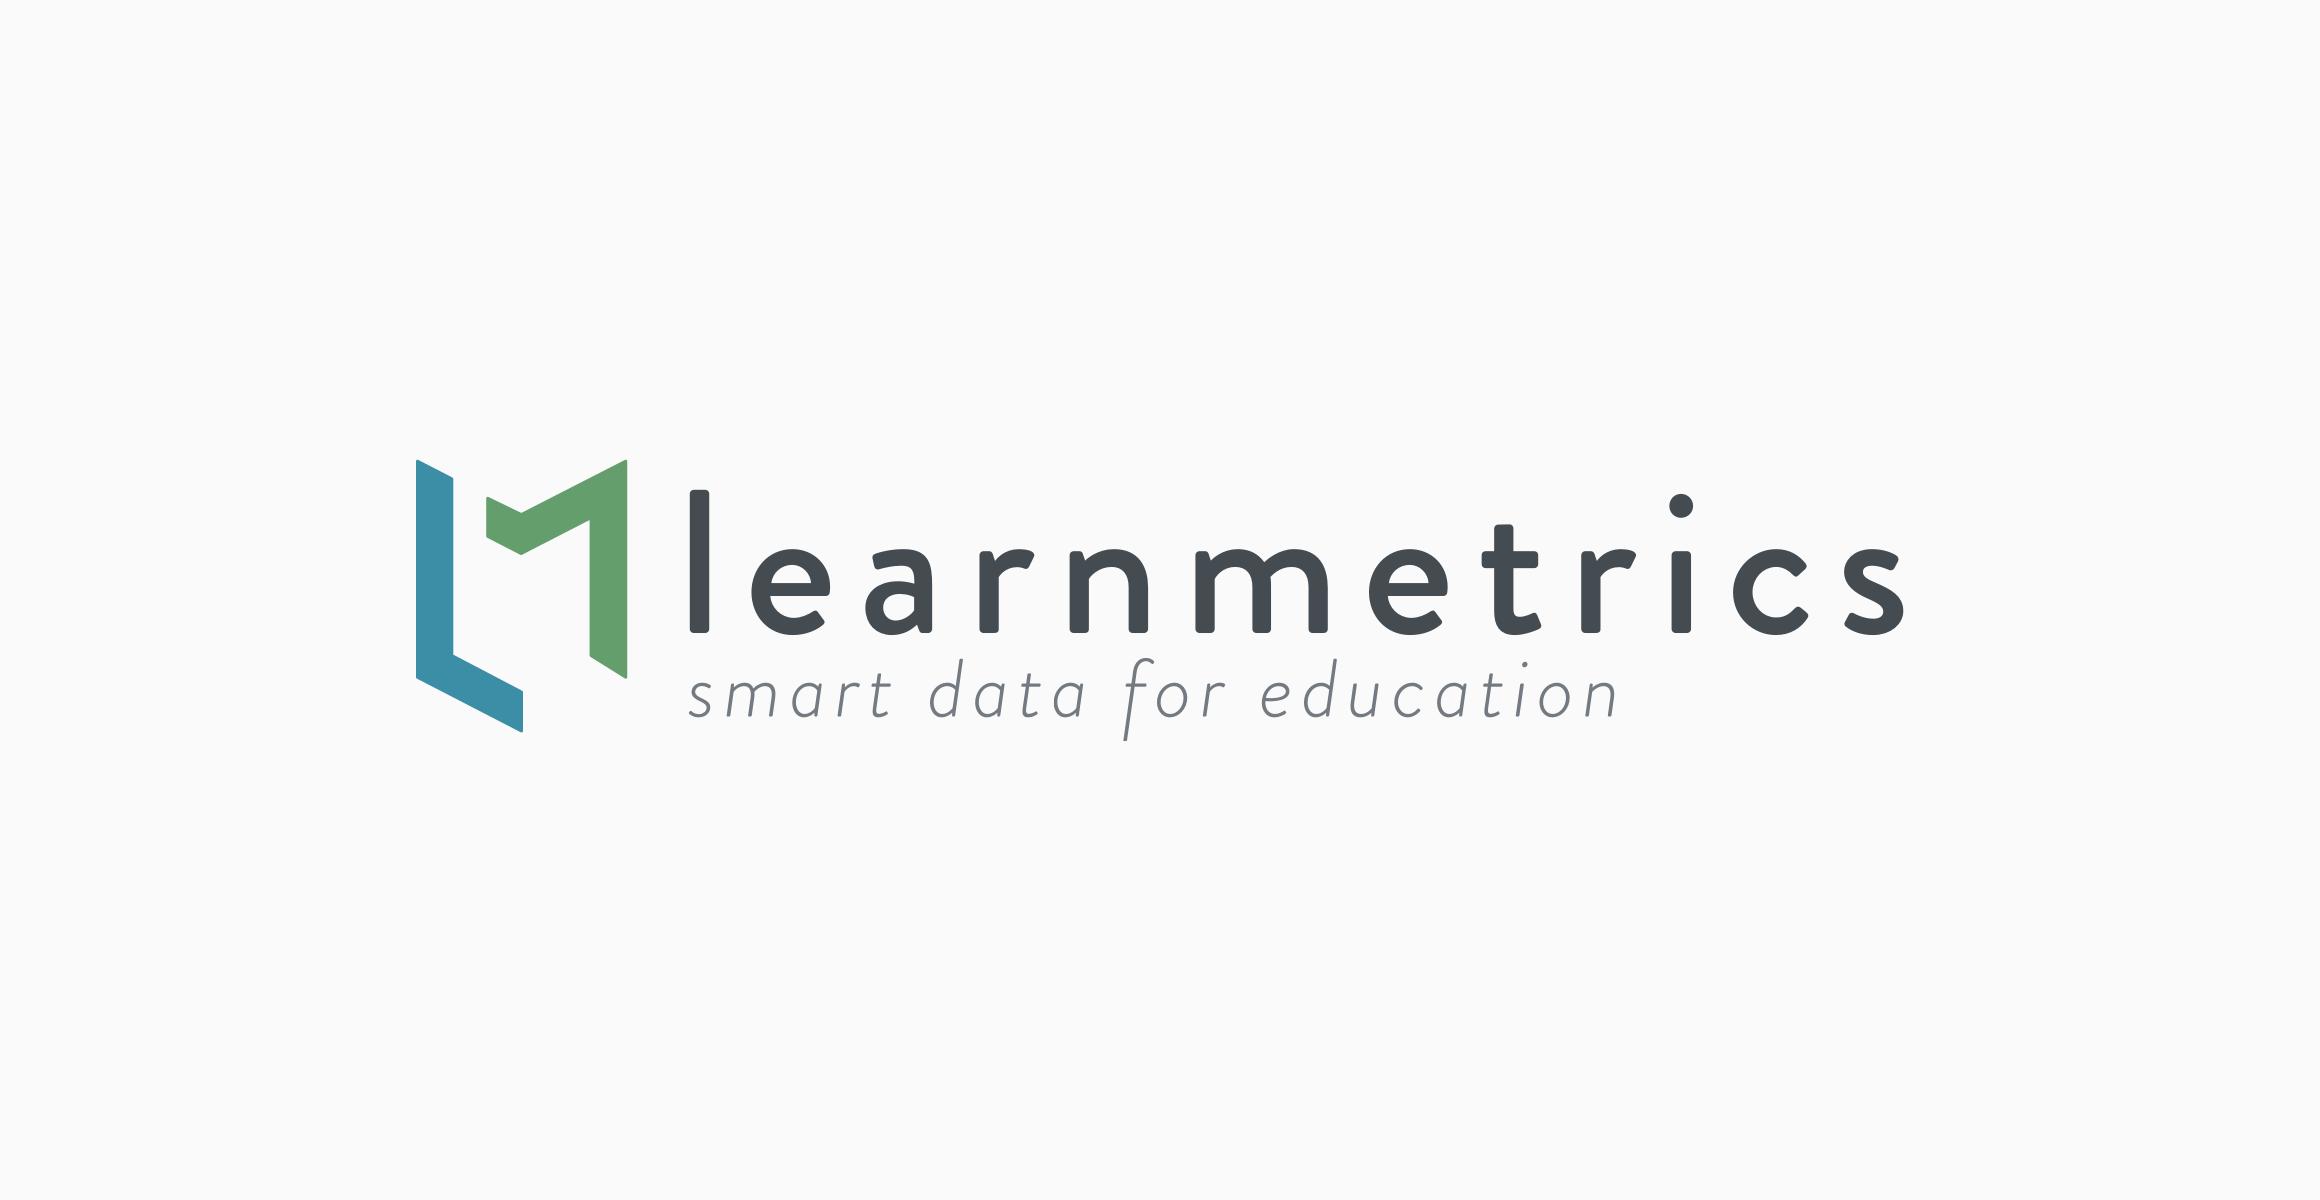 learnmetrics-logo